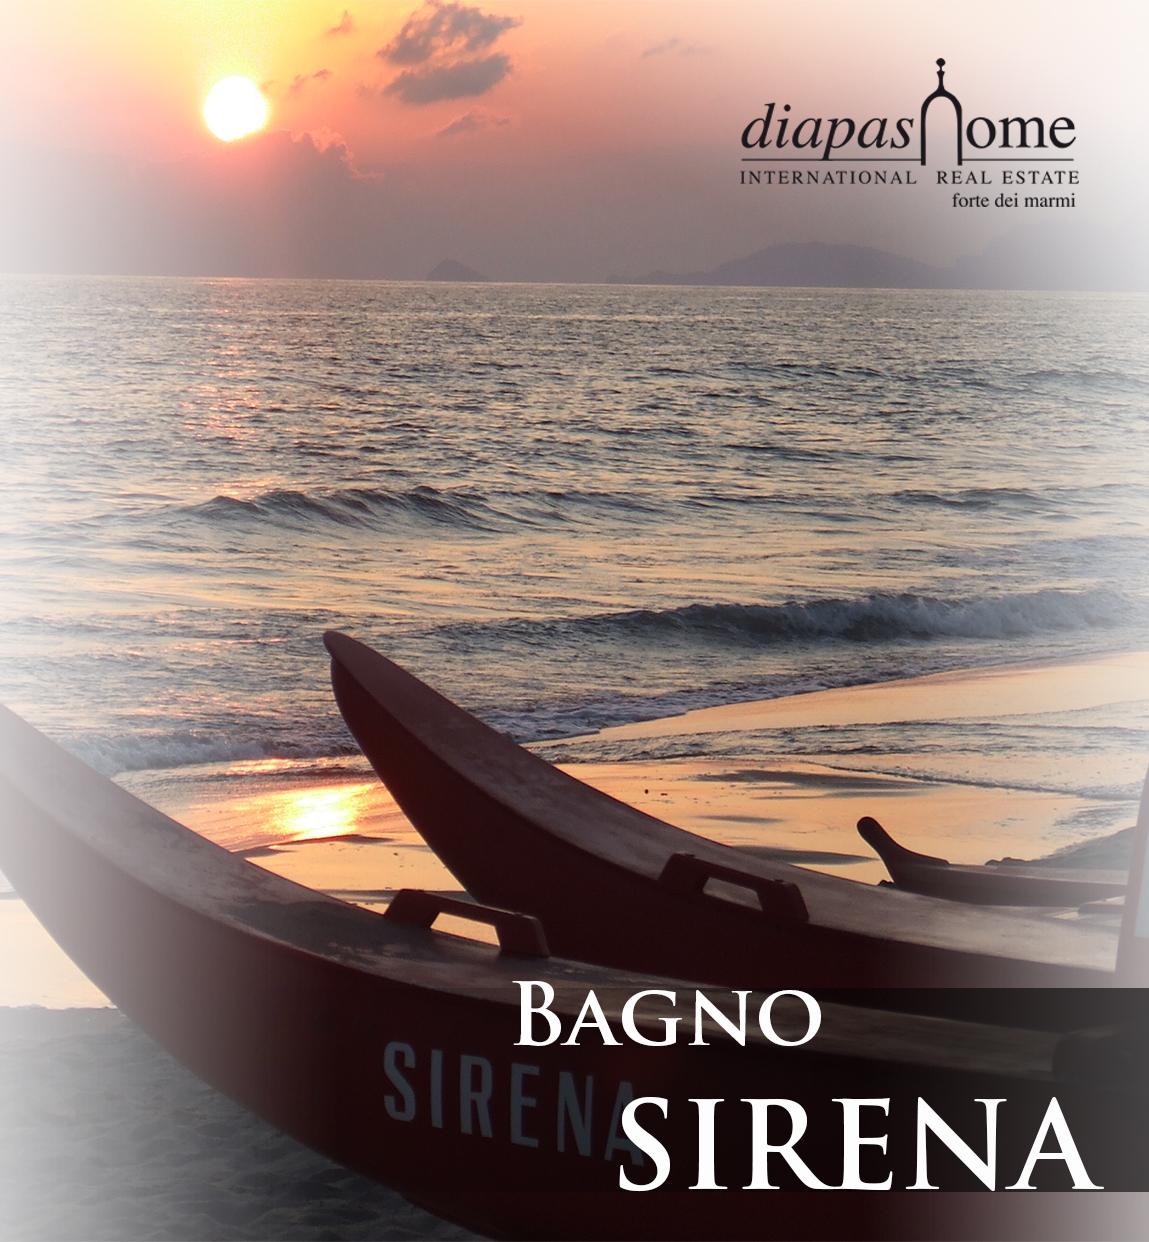 Bagno sirena forte dei marmi italy diapashome - Bagno italia forte dei marmi ...